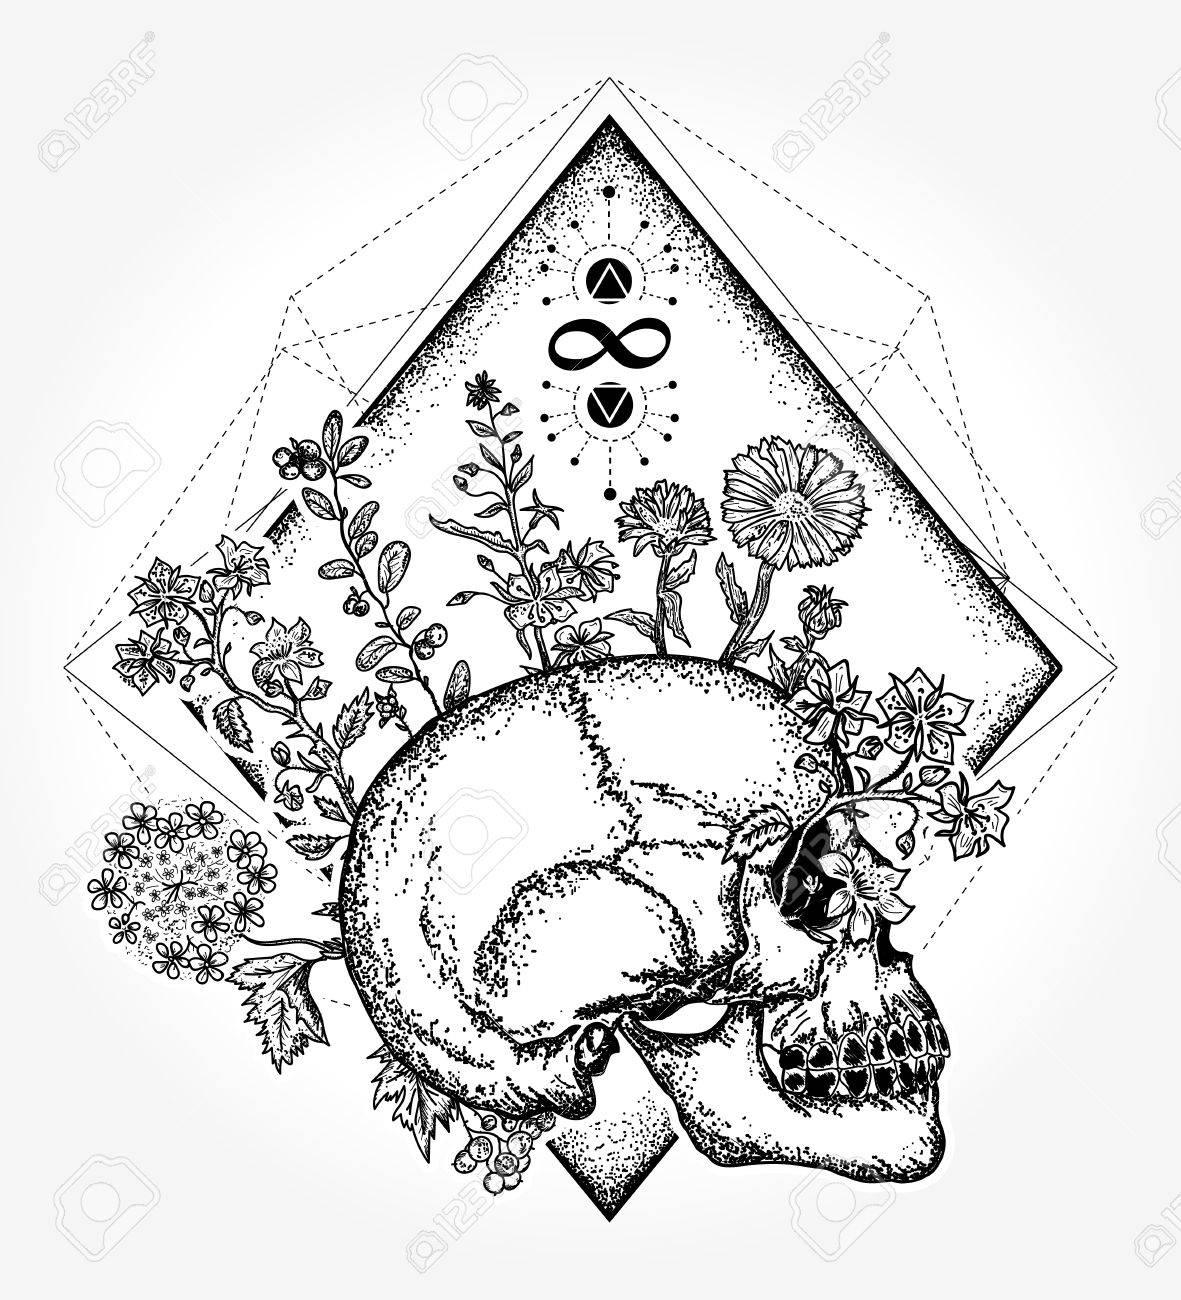 Magic skull tattoo and t-shirt design  Human skull through which